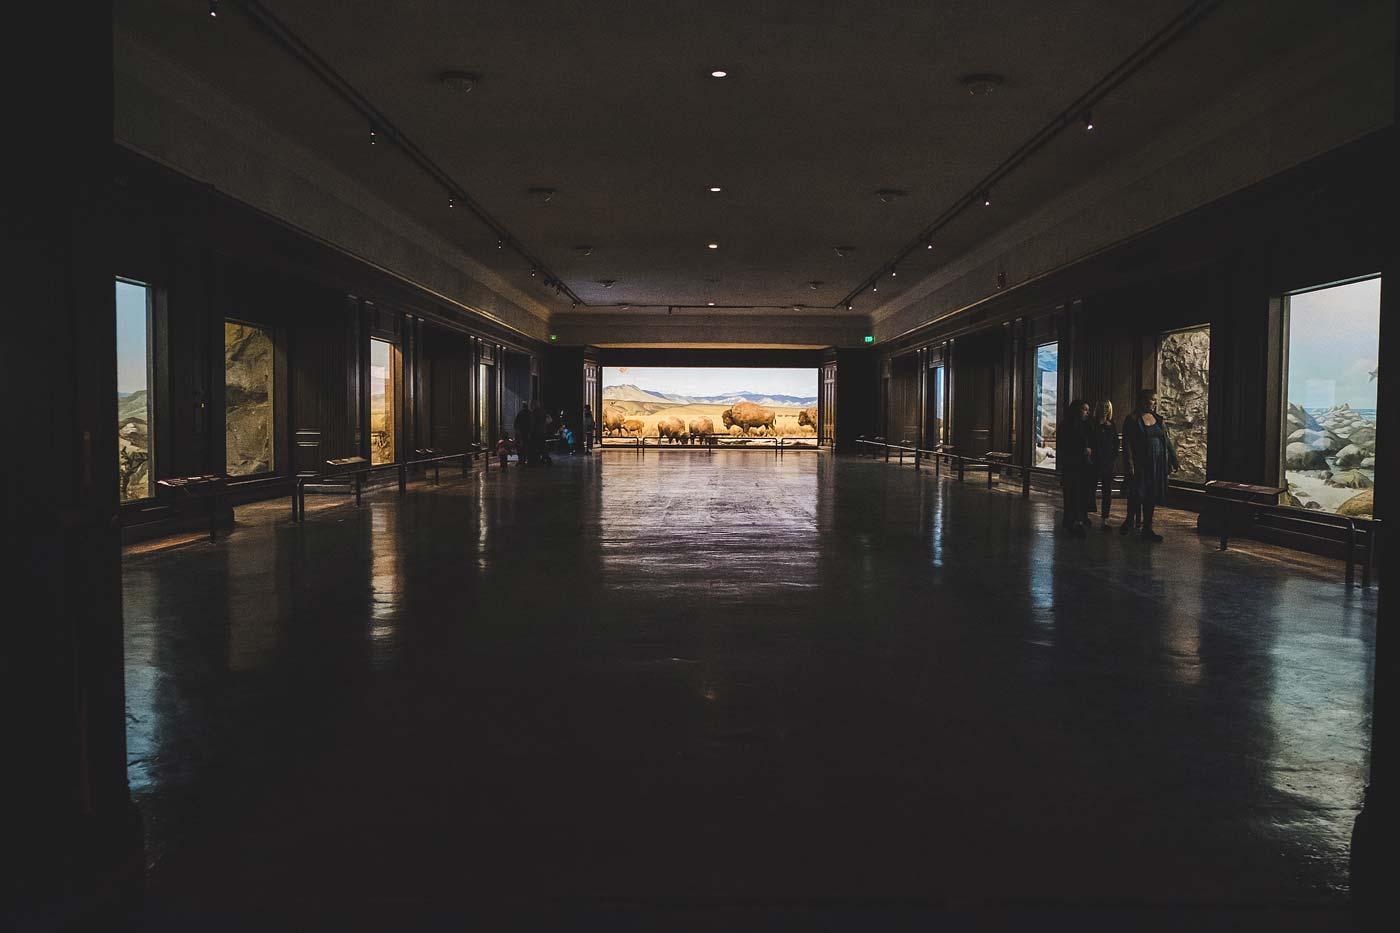 sNatural-History-Museum---Feb-2017-46.jpg